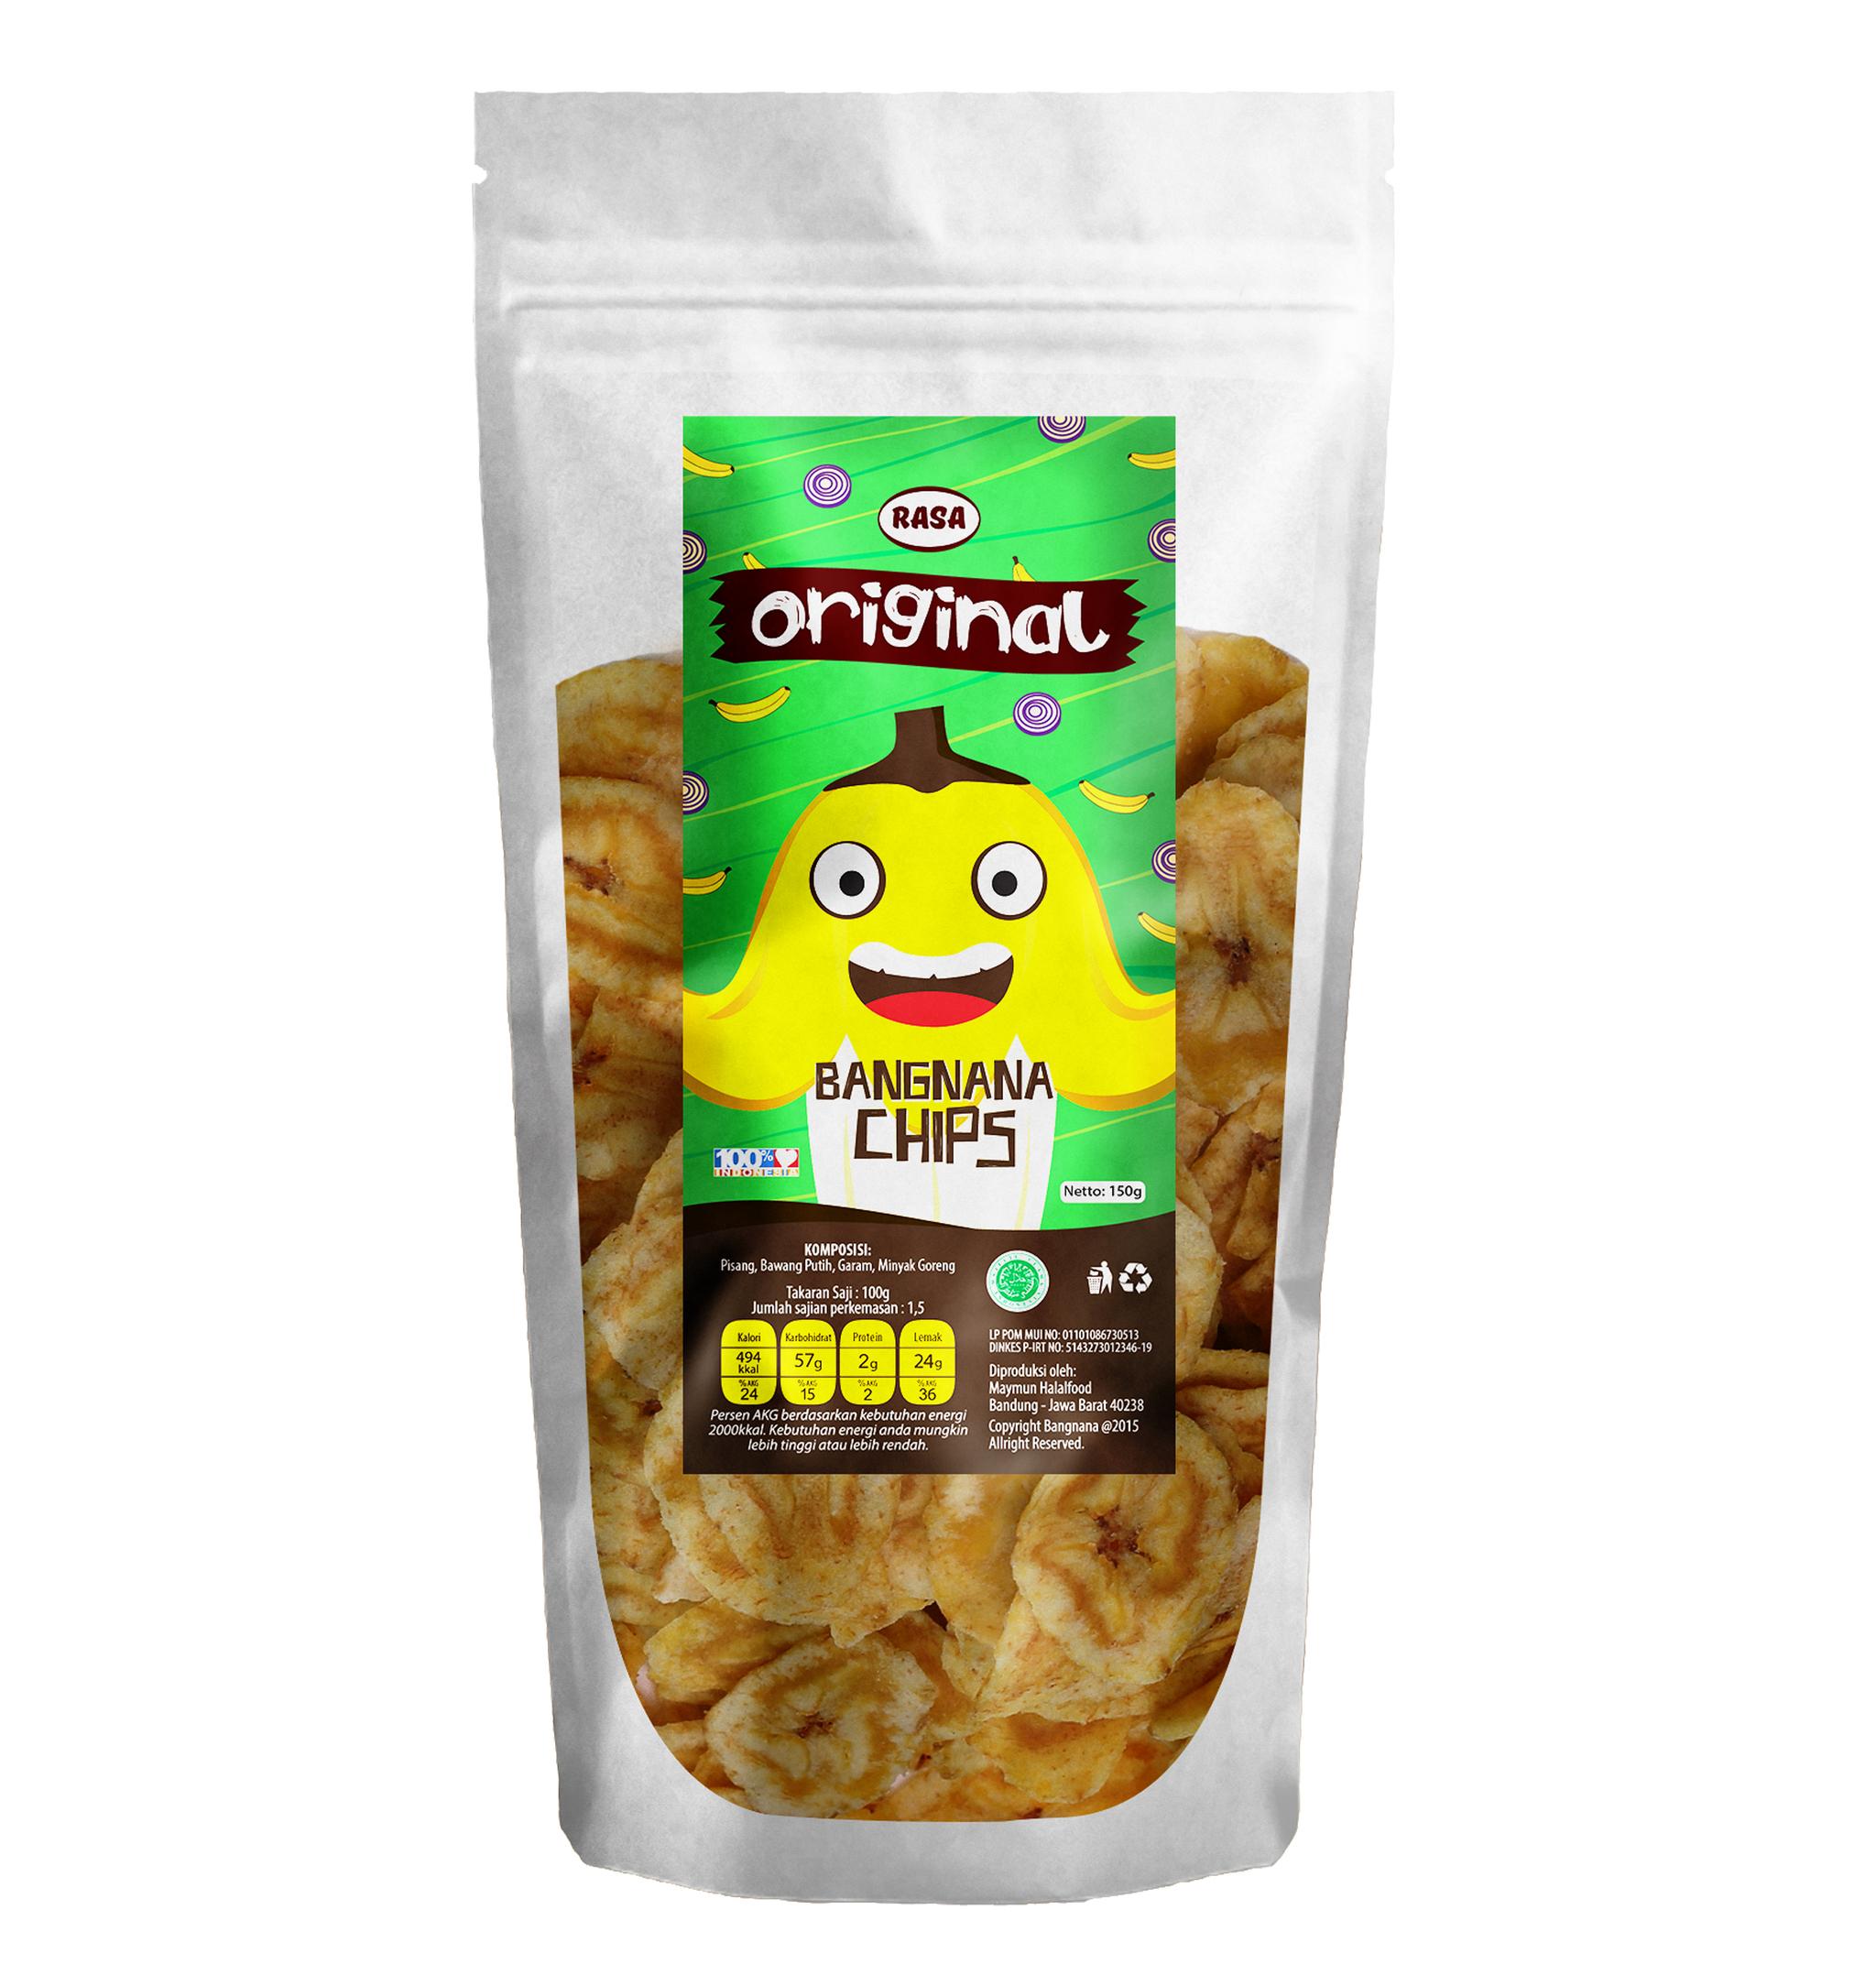 Jual Keripik Pisang Bangnana Chips Original Thistle Store Tokopedia